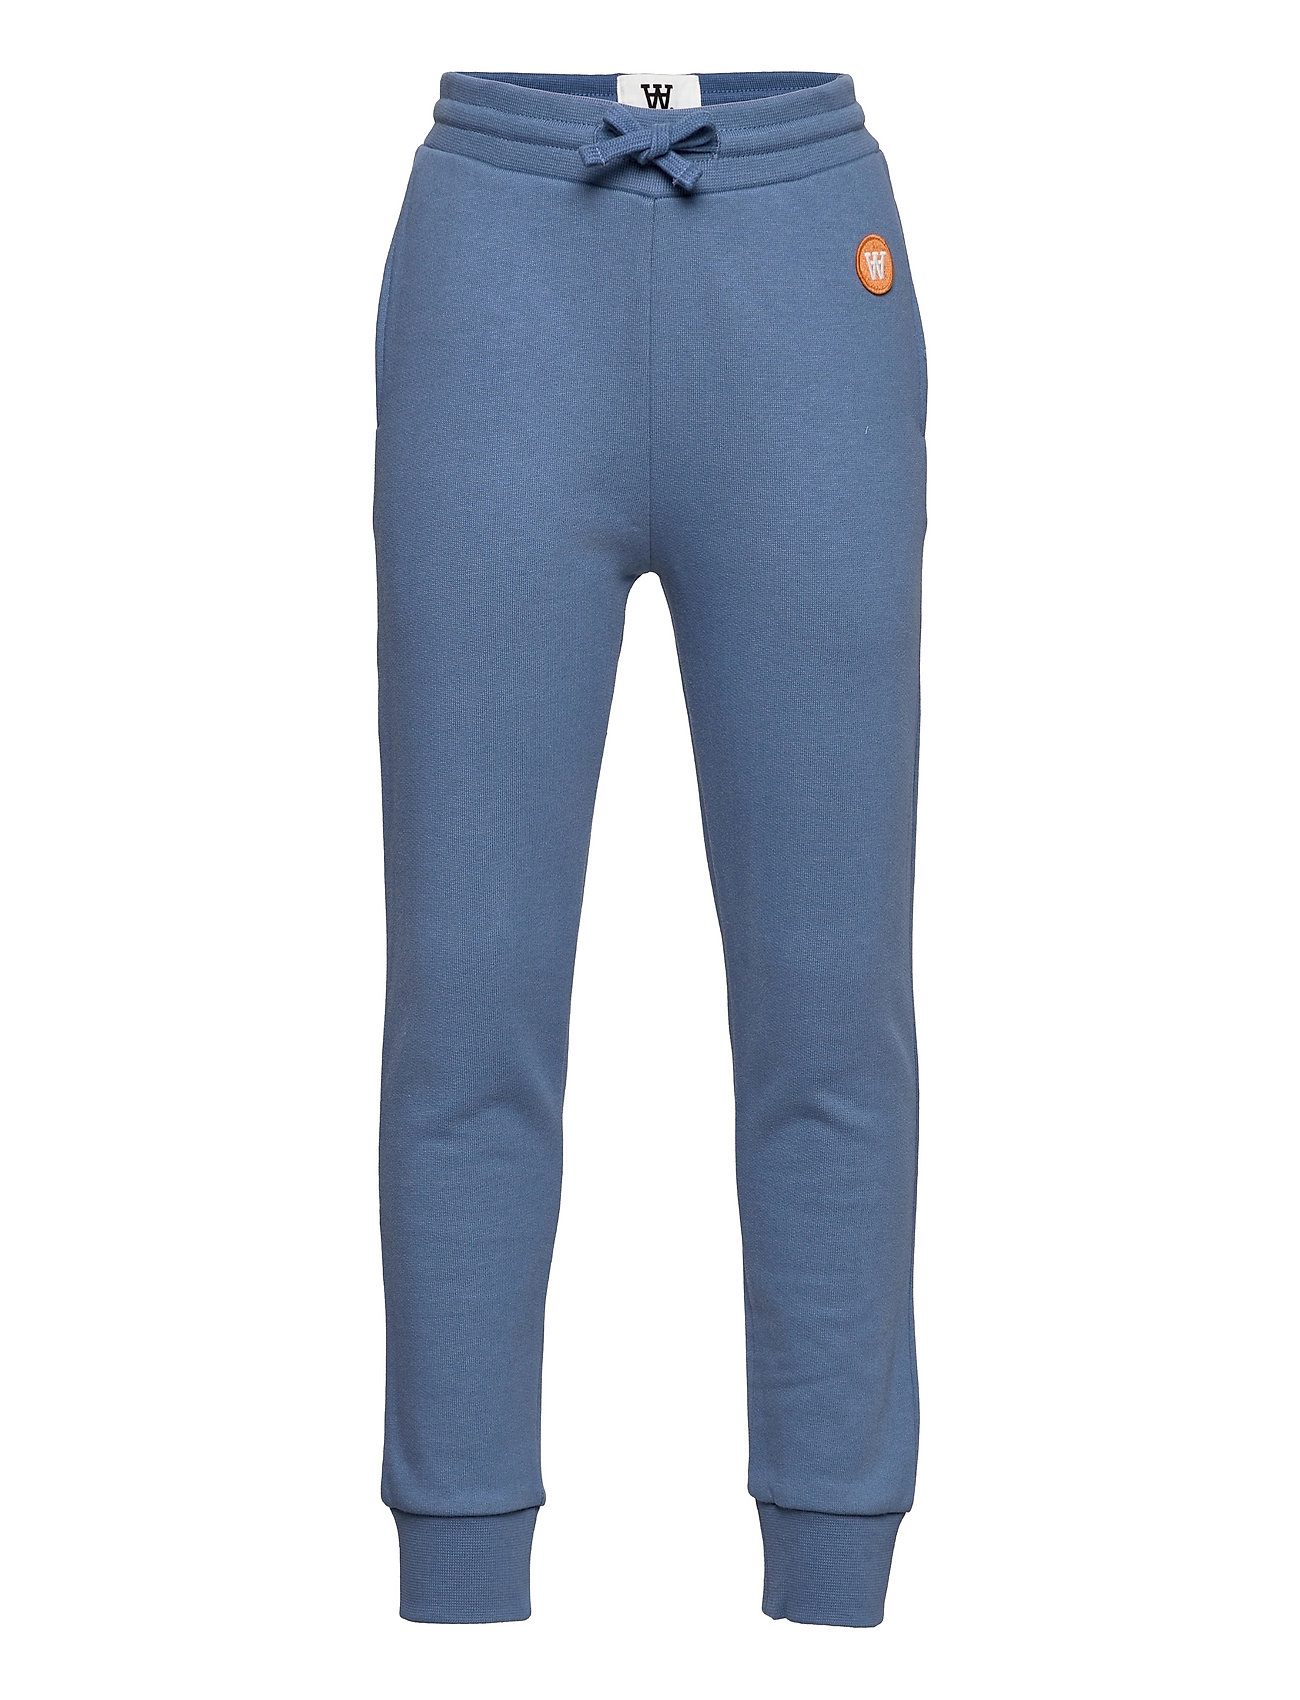 Ran Kids Trousers Sweatpants Hyggebukser Blå Wood Wood